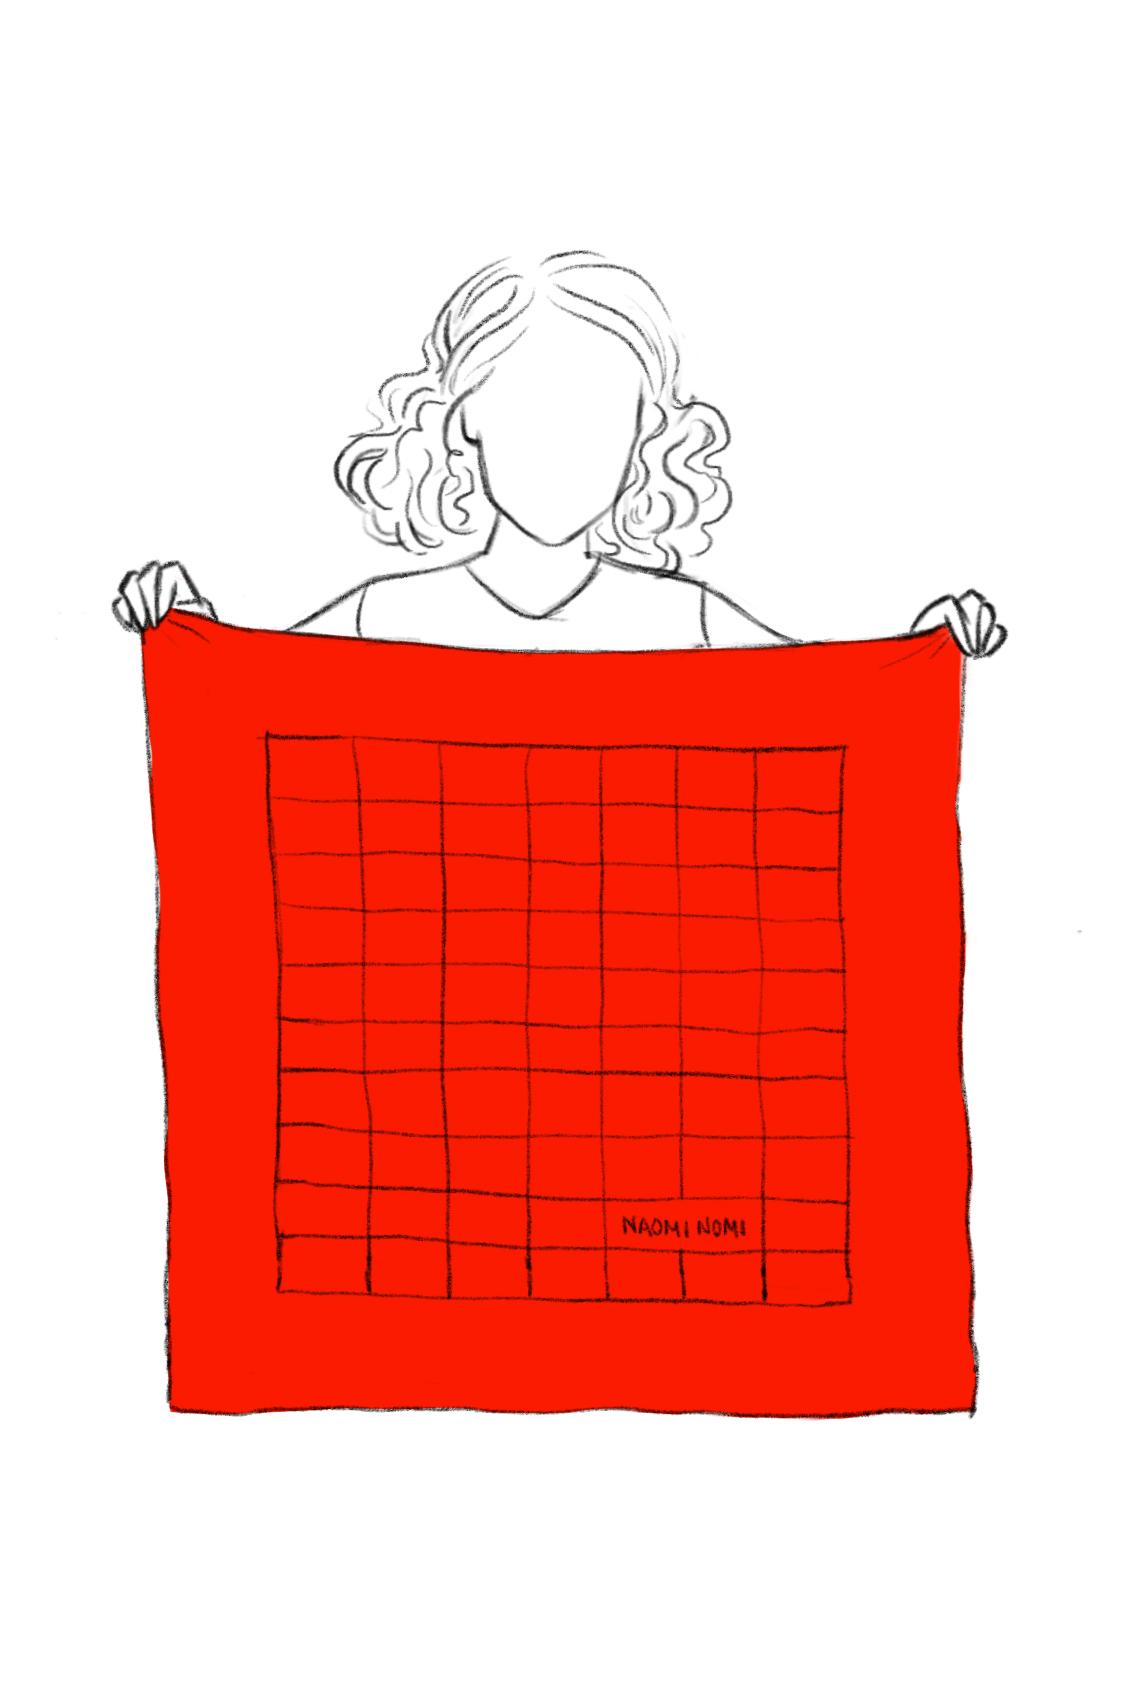 Girlscout1_Web.jpg